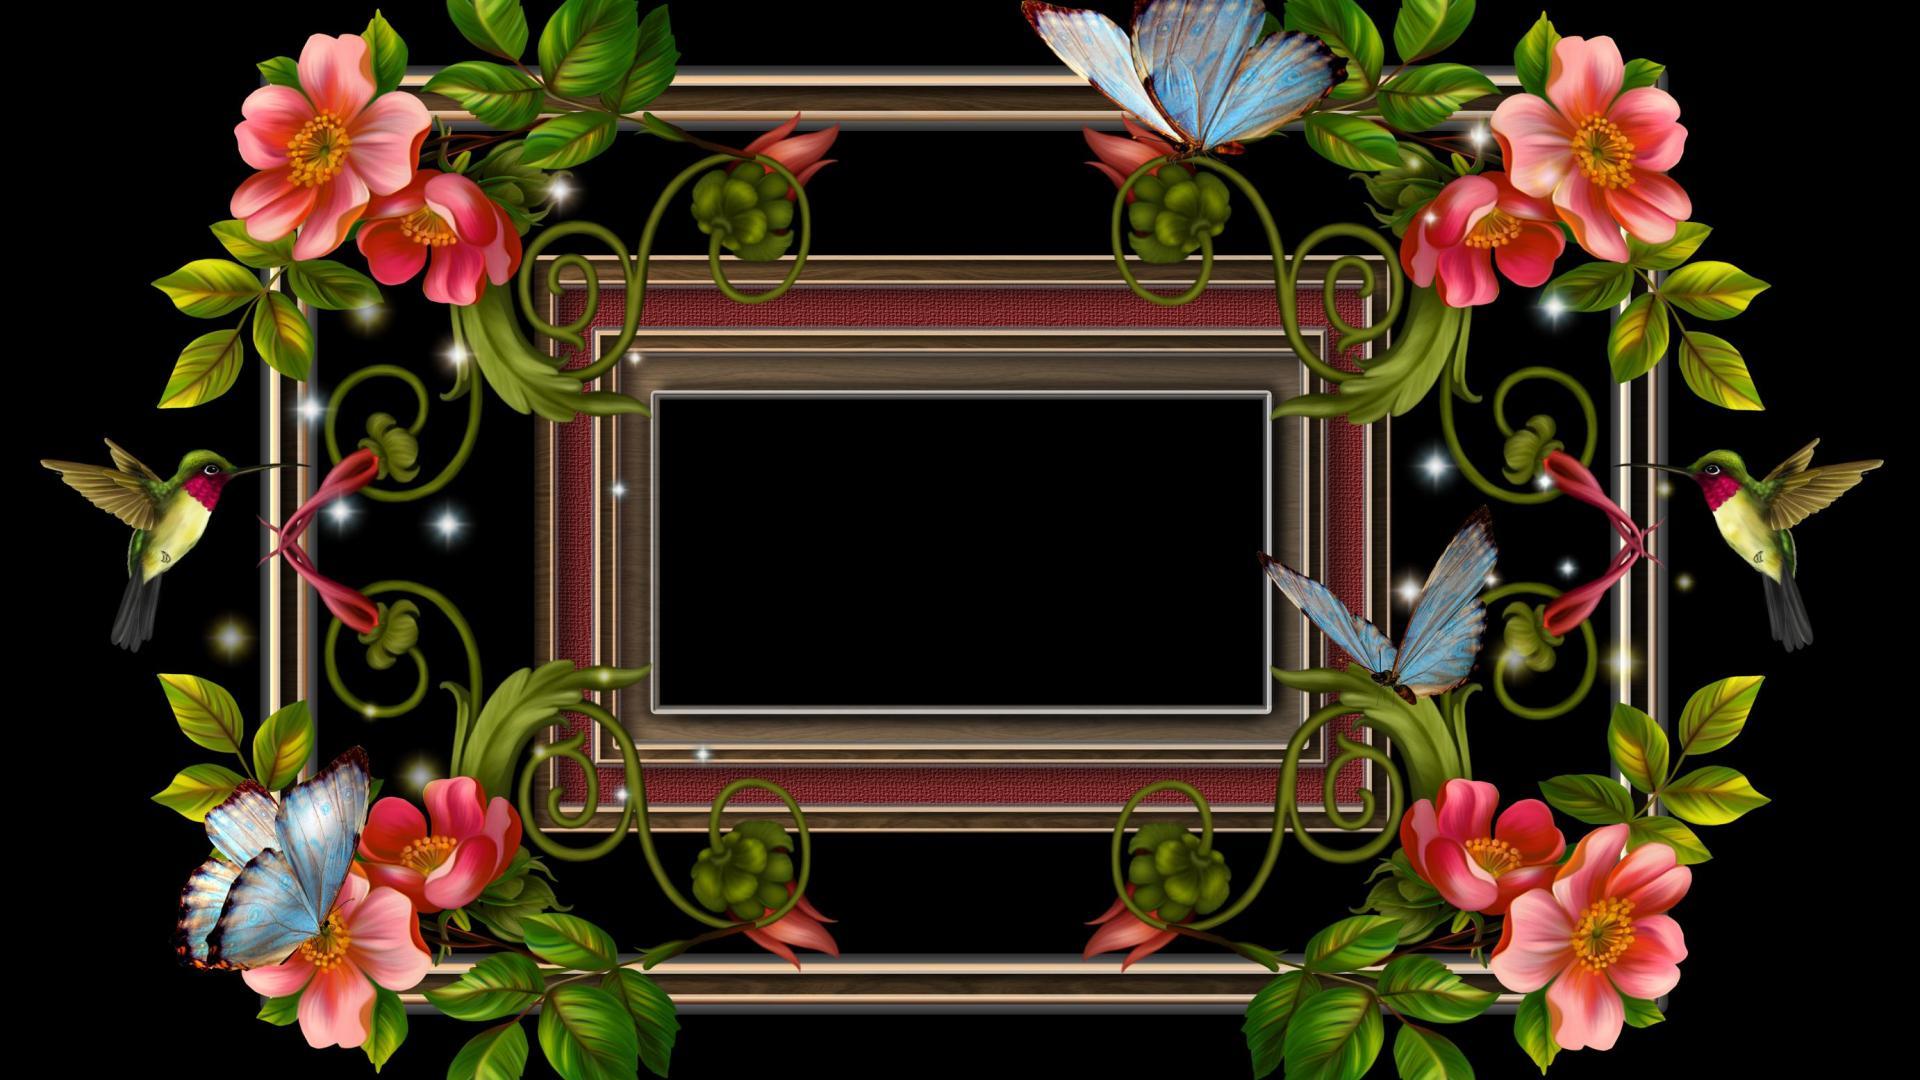 Flowers Photo Frame Hd - Flowers Healthy